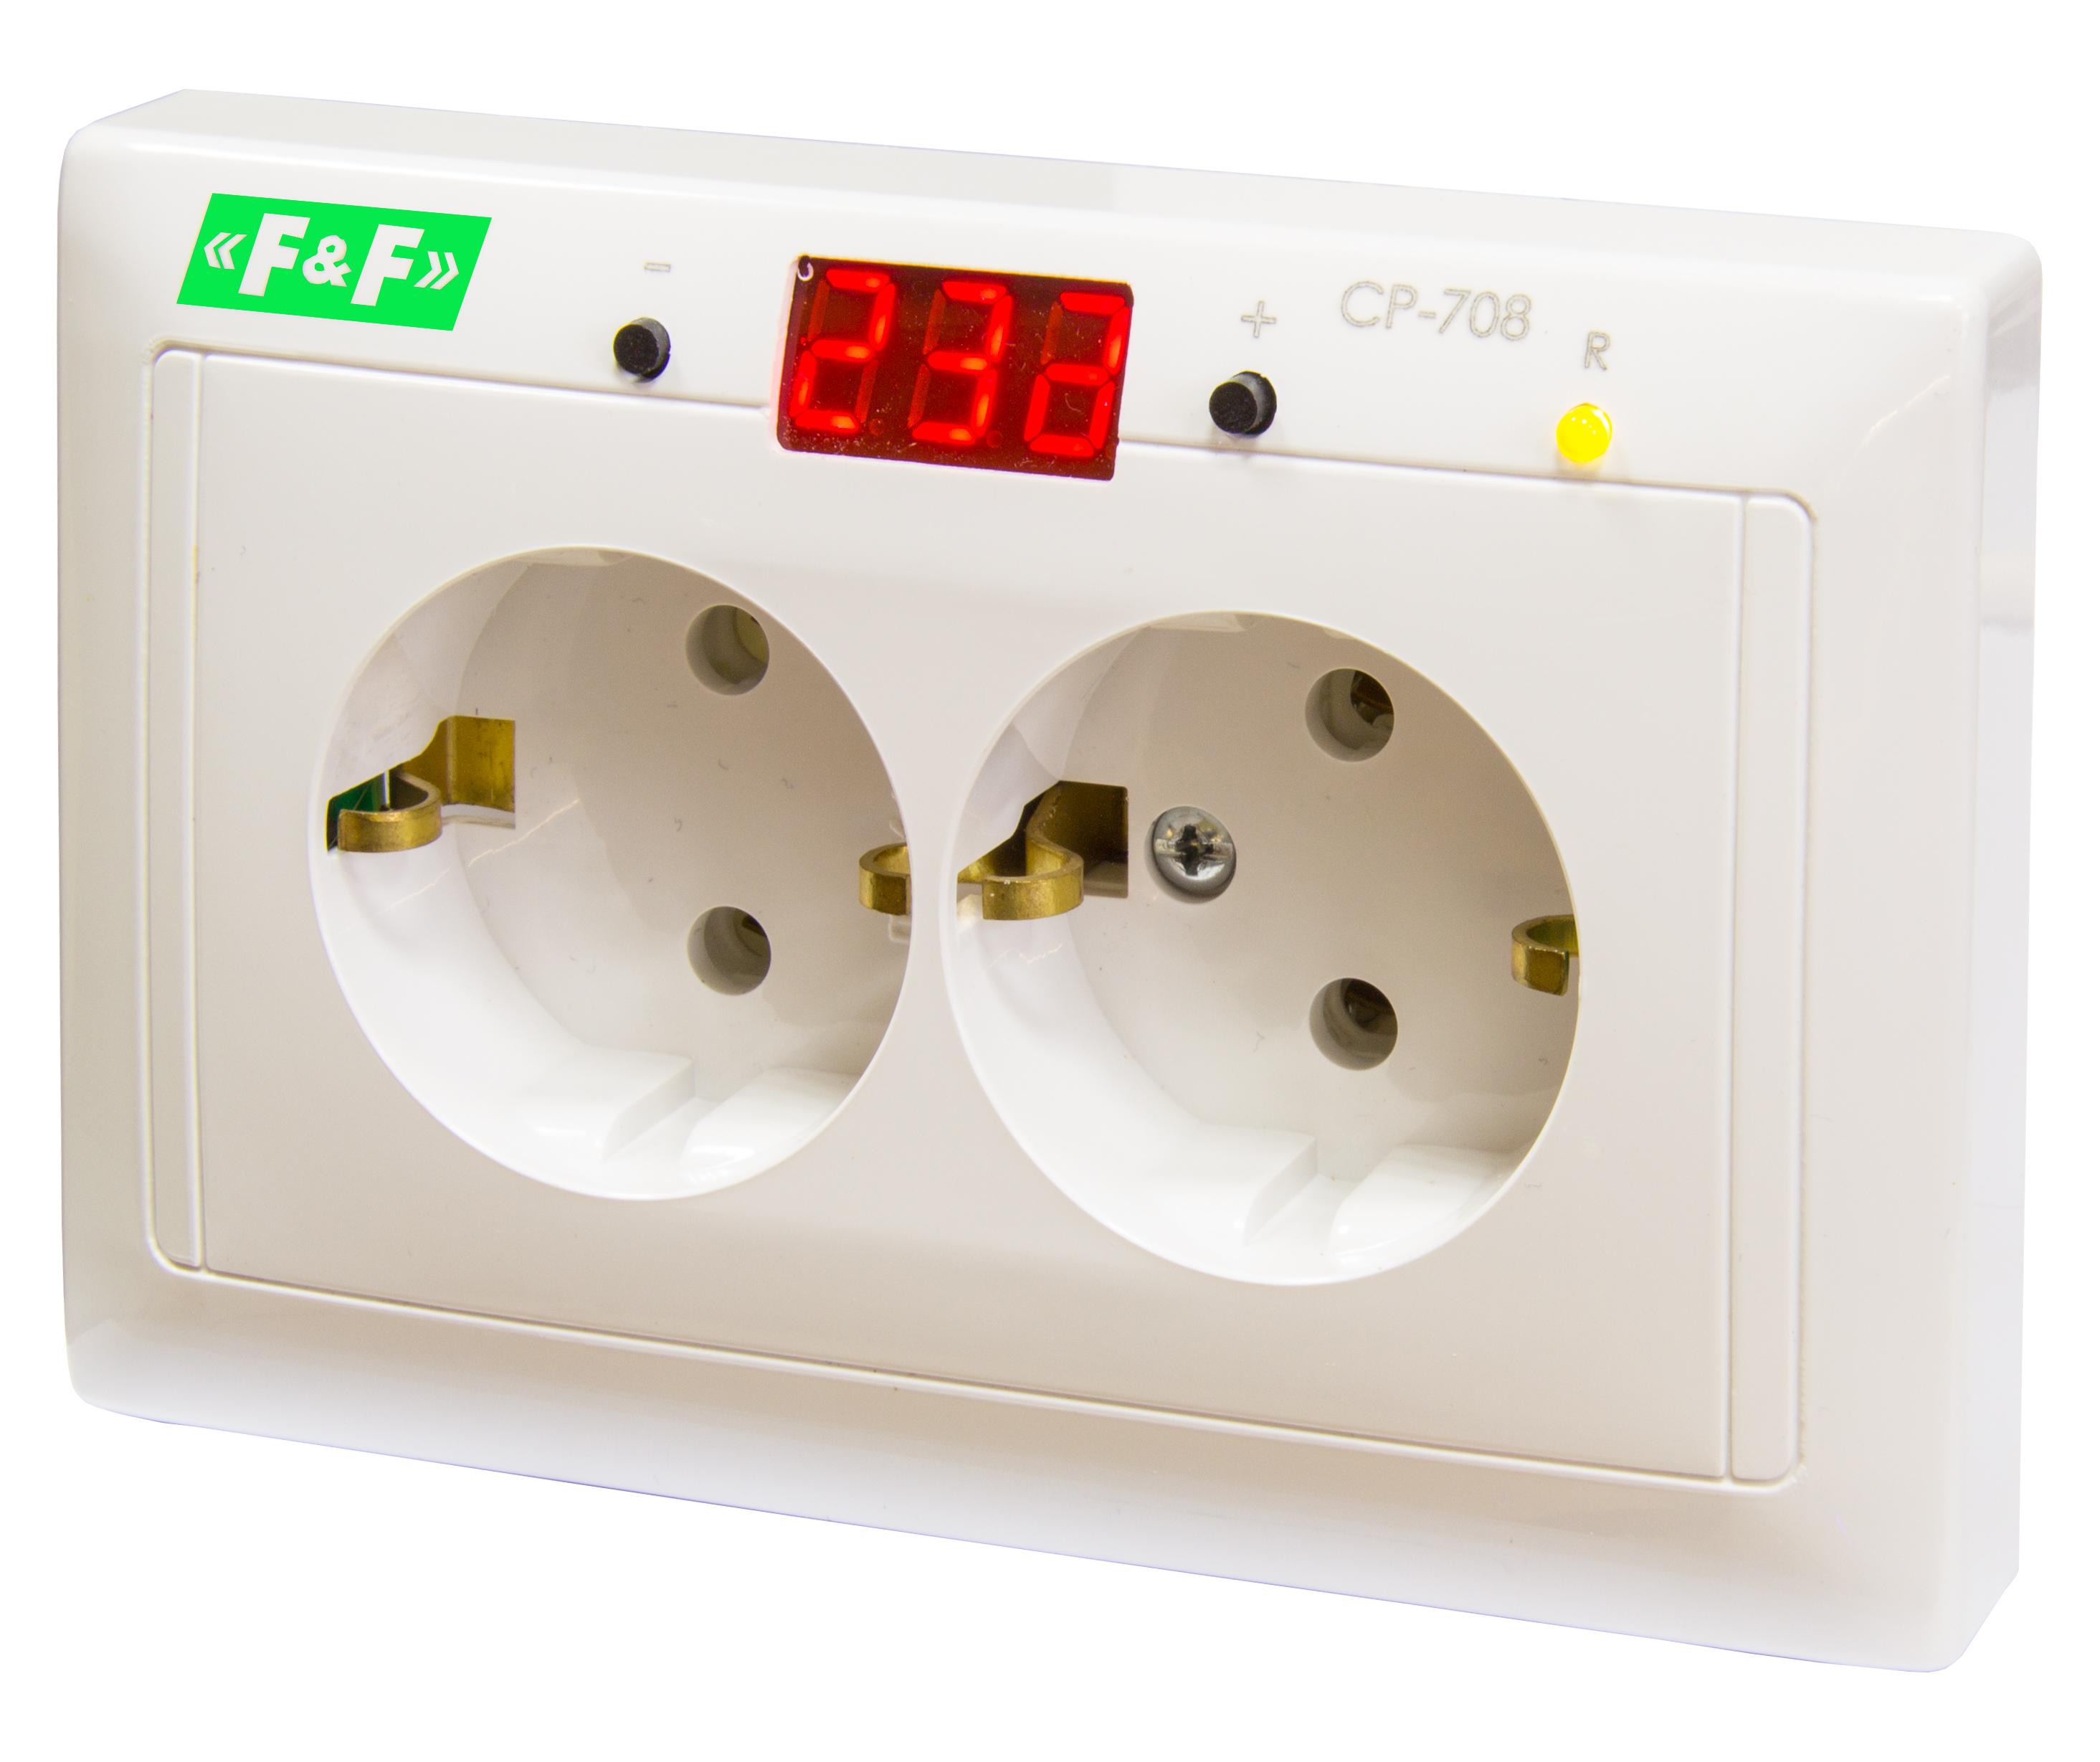 Купить Реле контроля 1-фаз. напряжения СР-708, 16А 150-300В АС 1NO (в монт. коробку) Ко, Евроавтоматика ФиФ